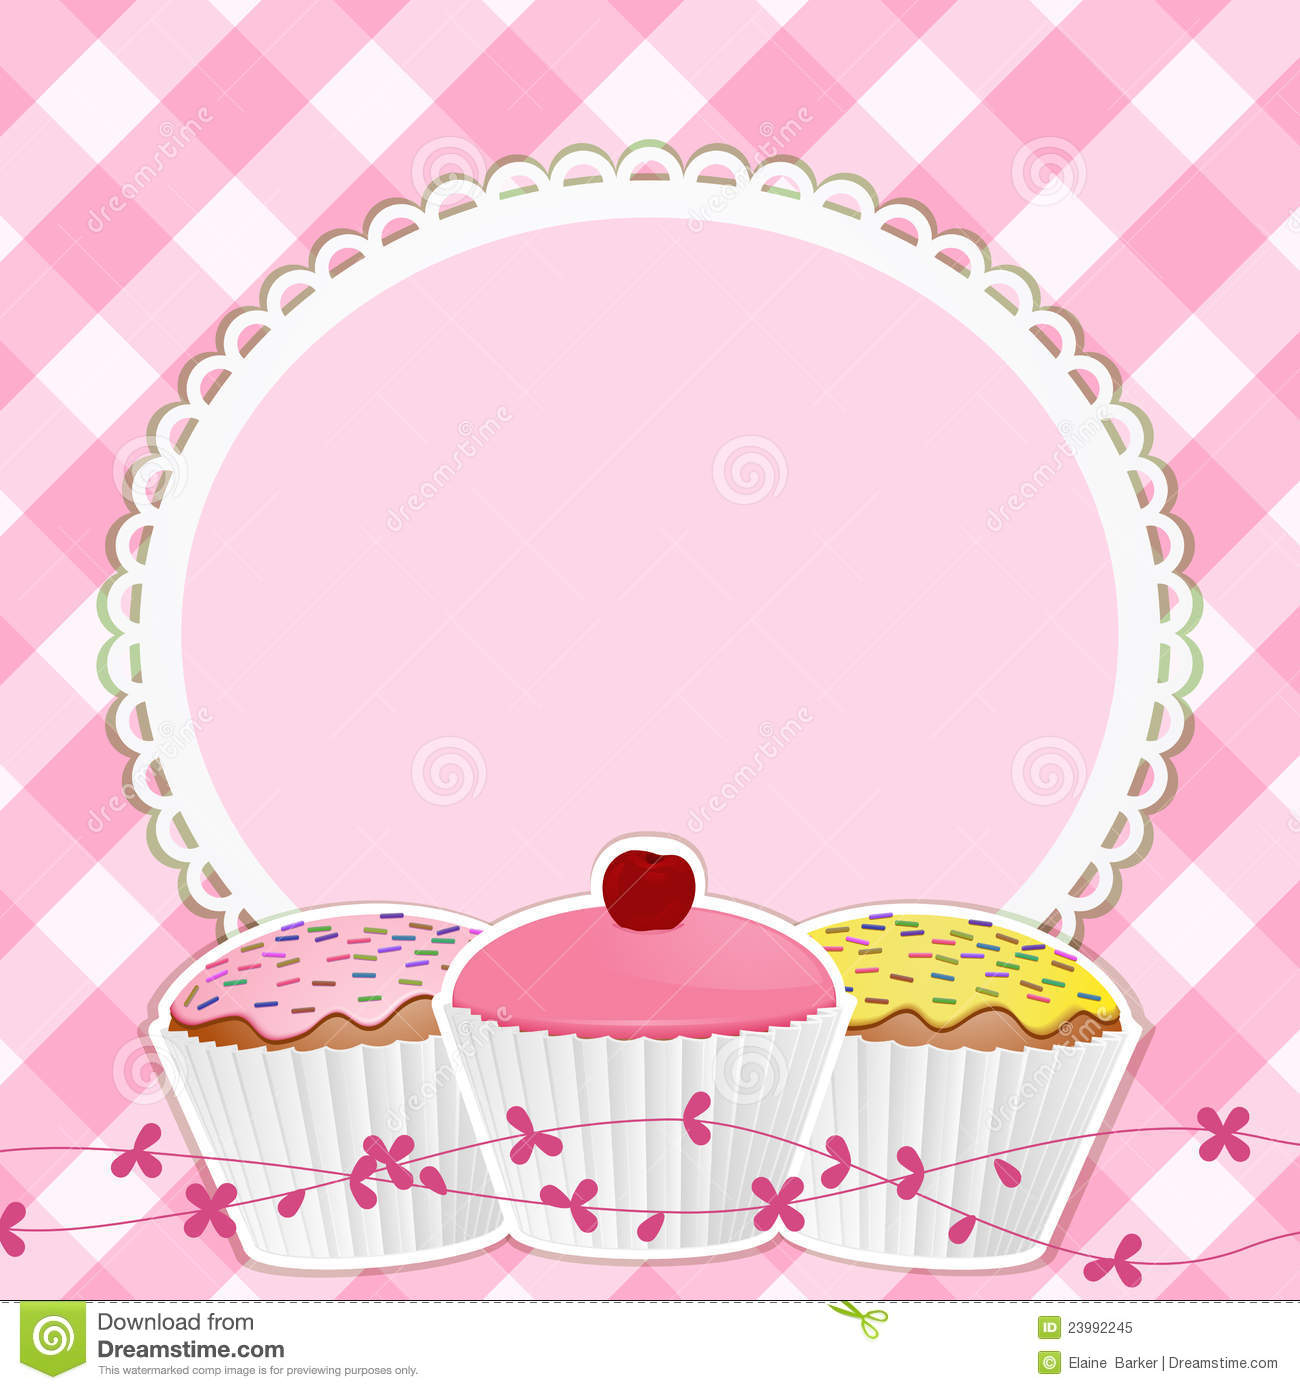 Clipart cupcake border clip free stock Cupcakes clipart border 2 » Clipart Station clip free stock